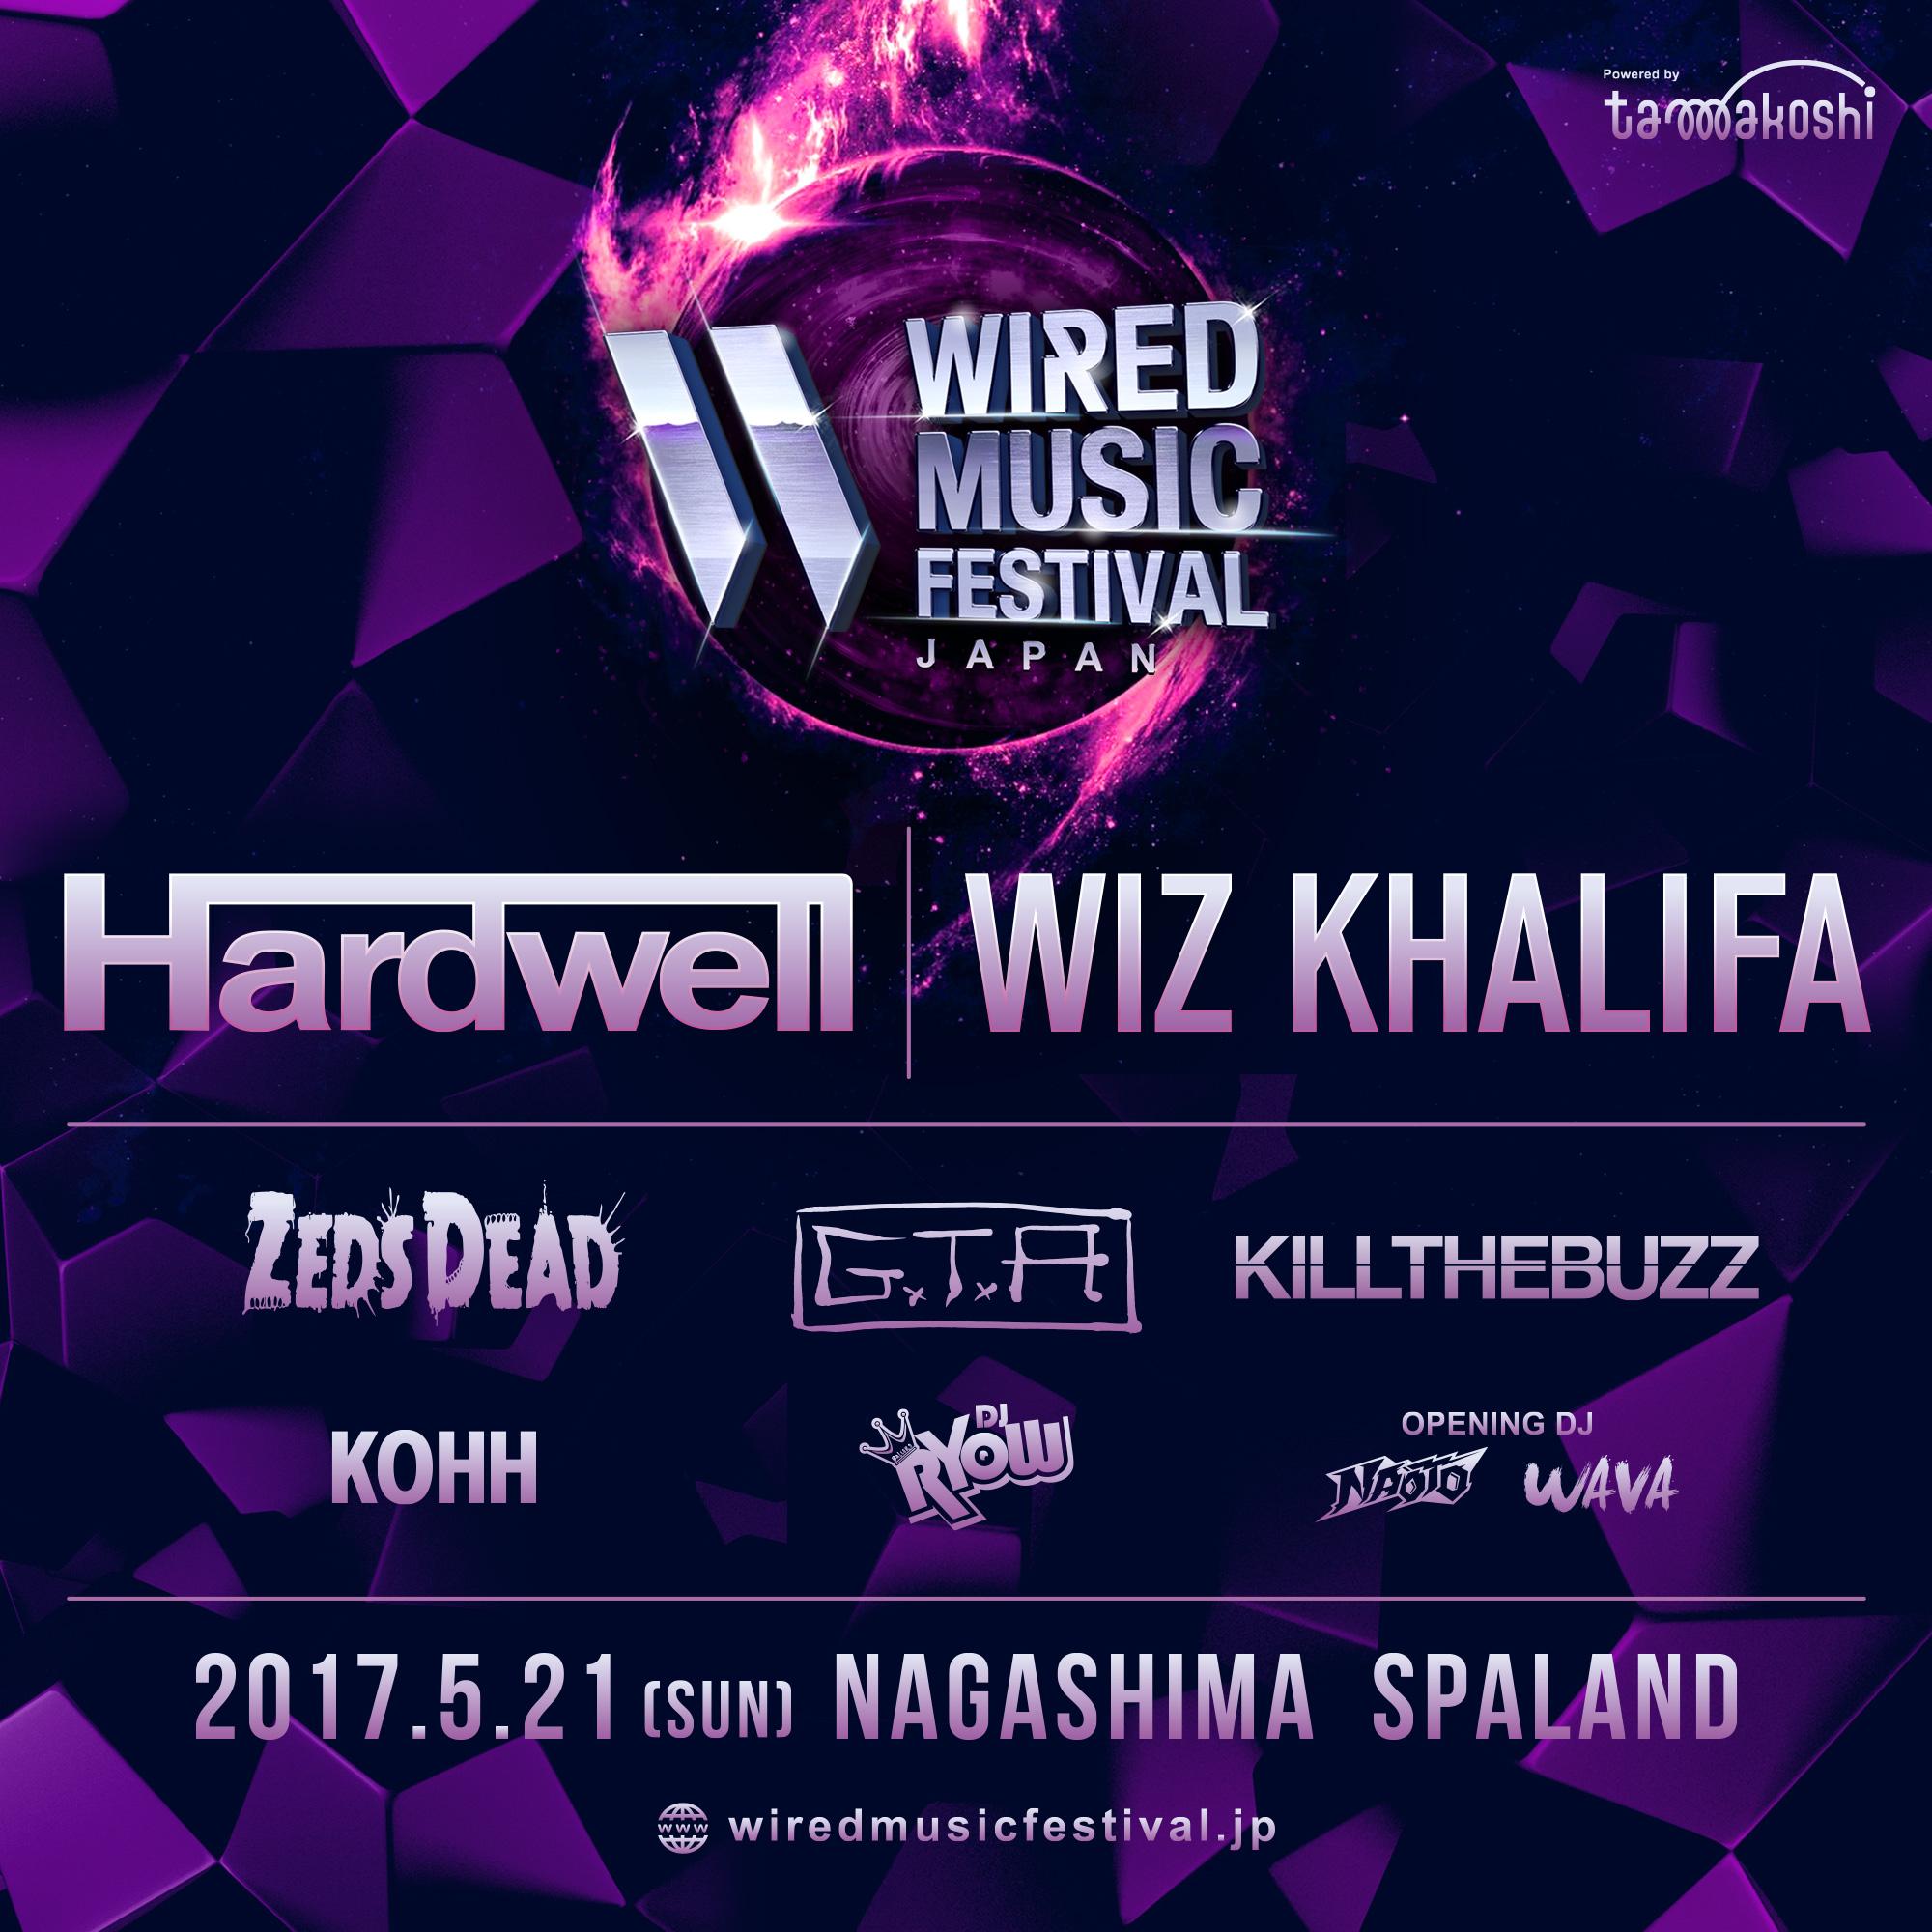 Zeds Dead、GTA、KILL THE BUZZ、KOHH、DJ RYOWらも出演!「WIRED MUSIC FESTIVAL'17」第3弾ラインナップ発表